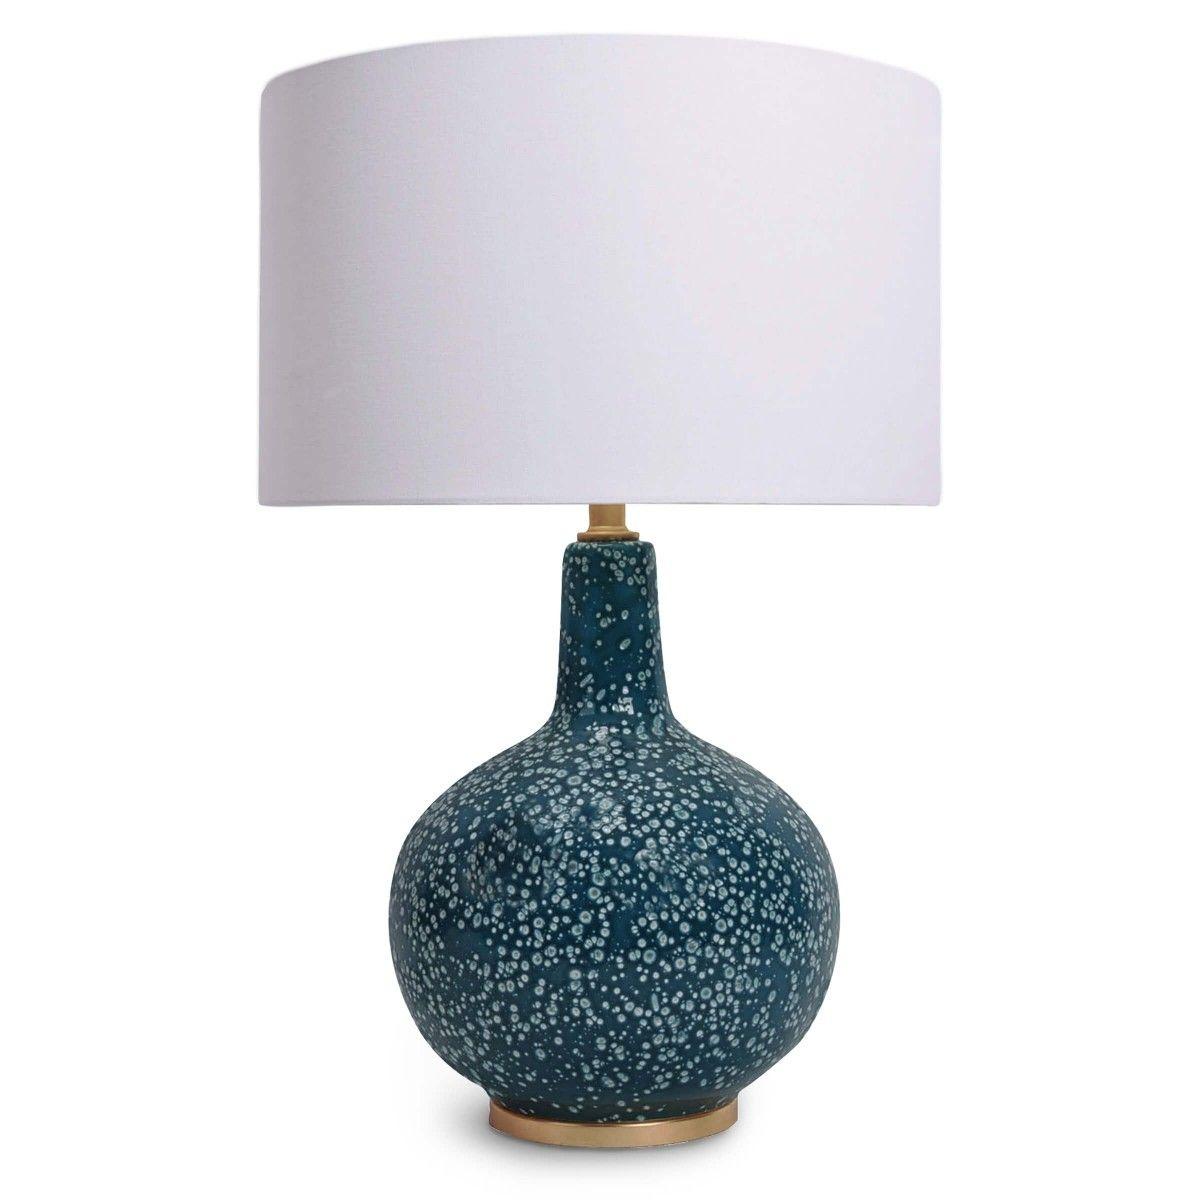 small resolution of bulb qty 1 socket e26 3 way cast turn knob wiring type standard material ceramic finish blue